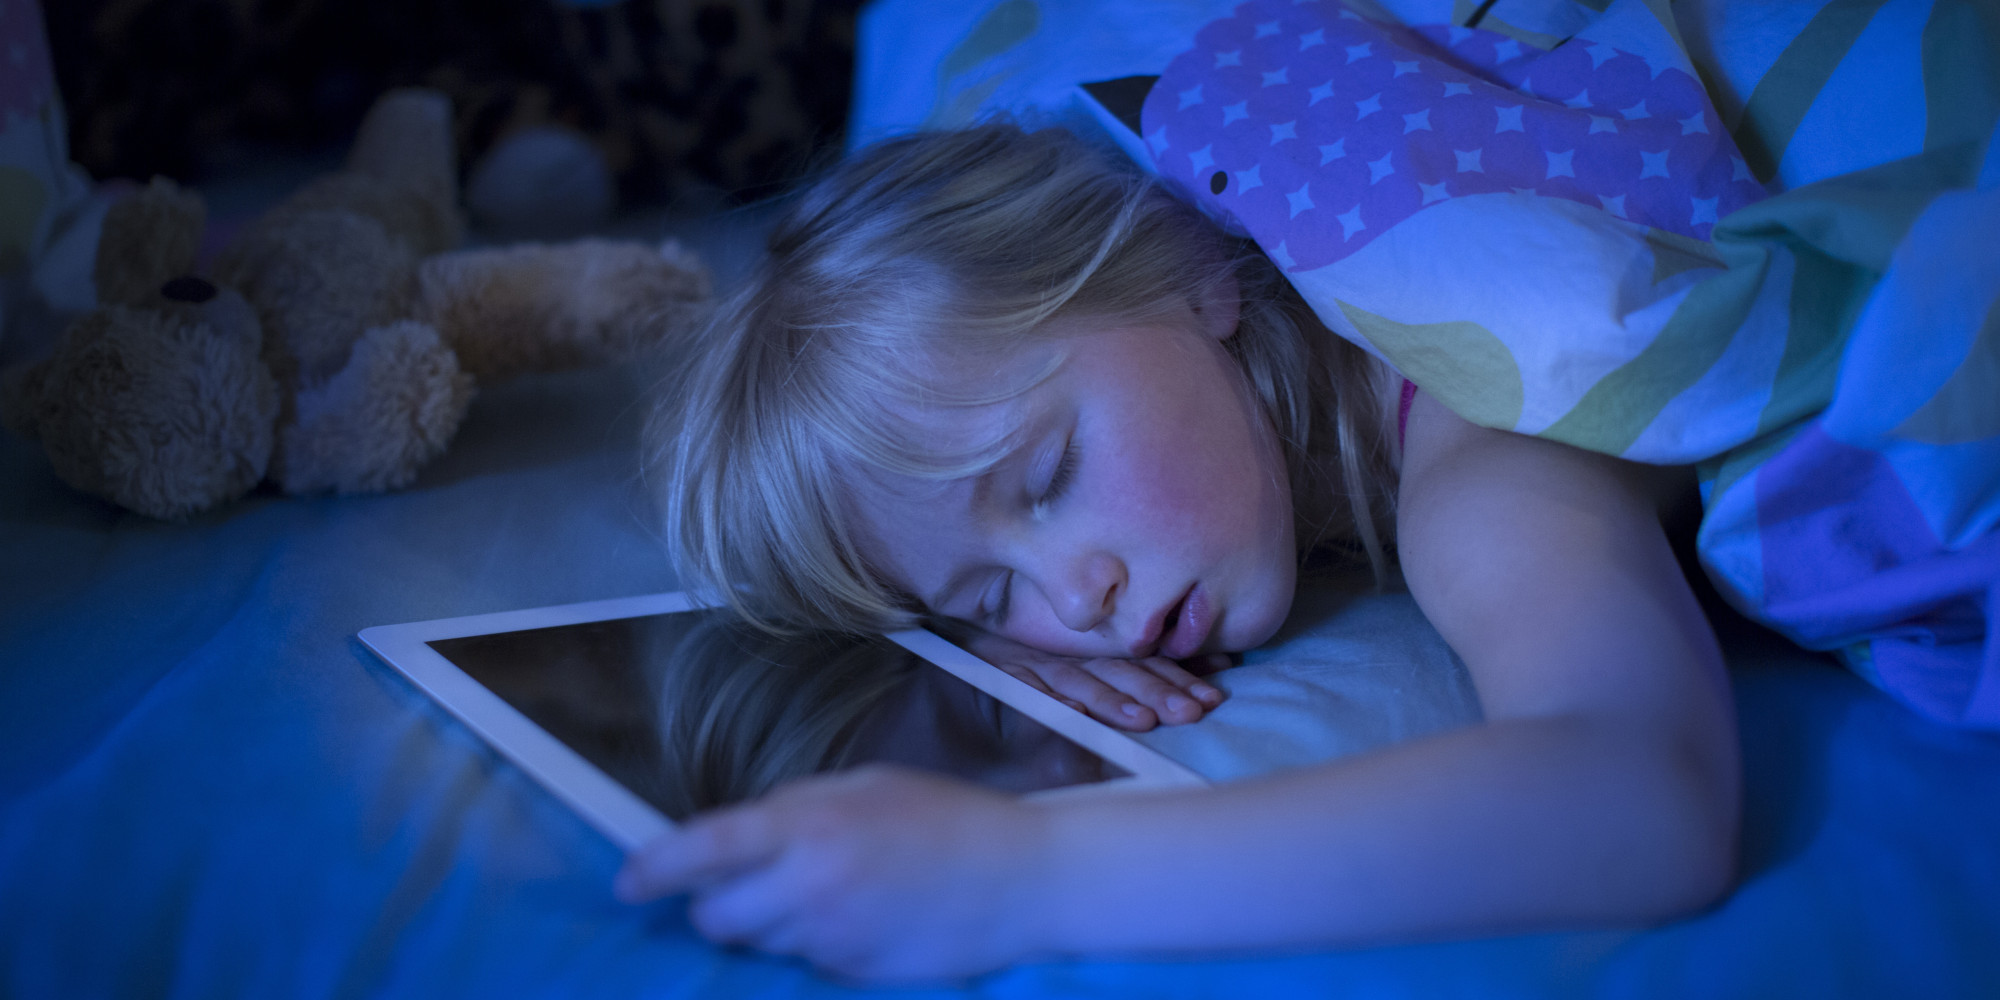 Ребенок спит с телефоном фото